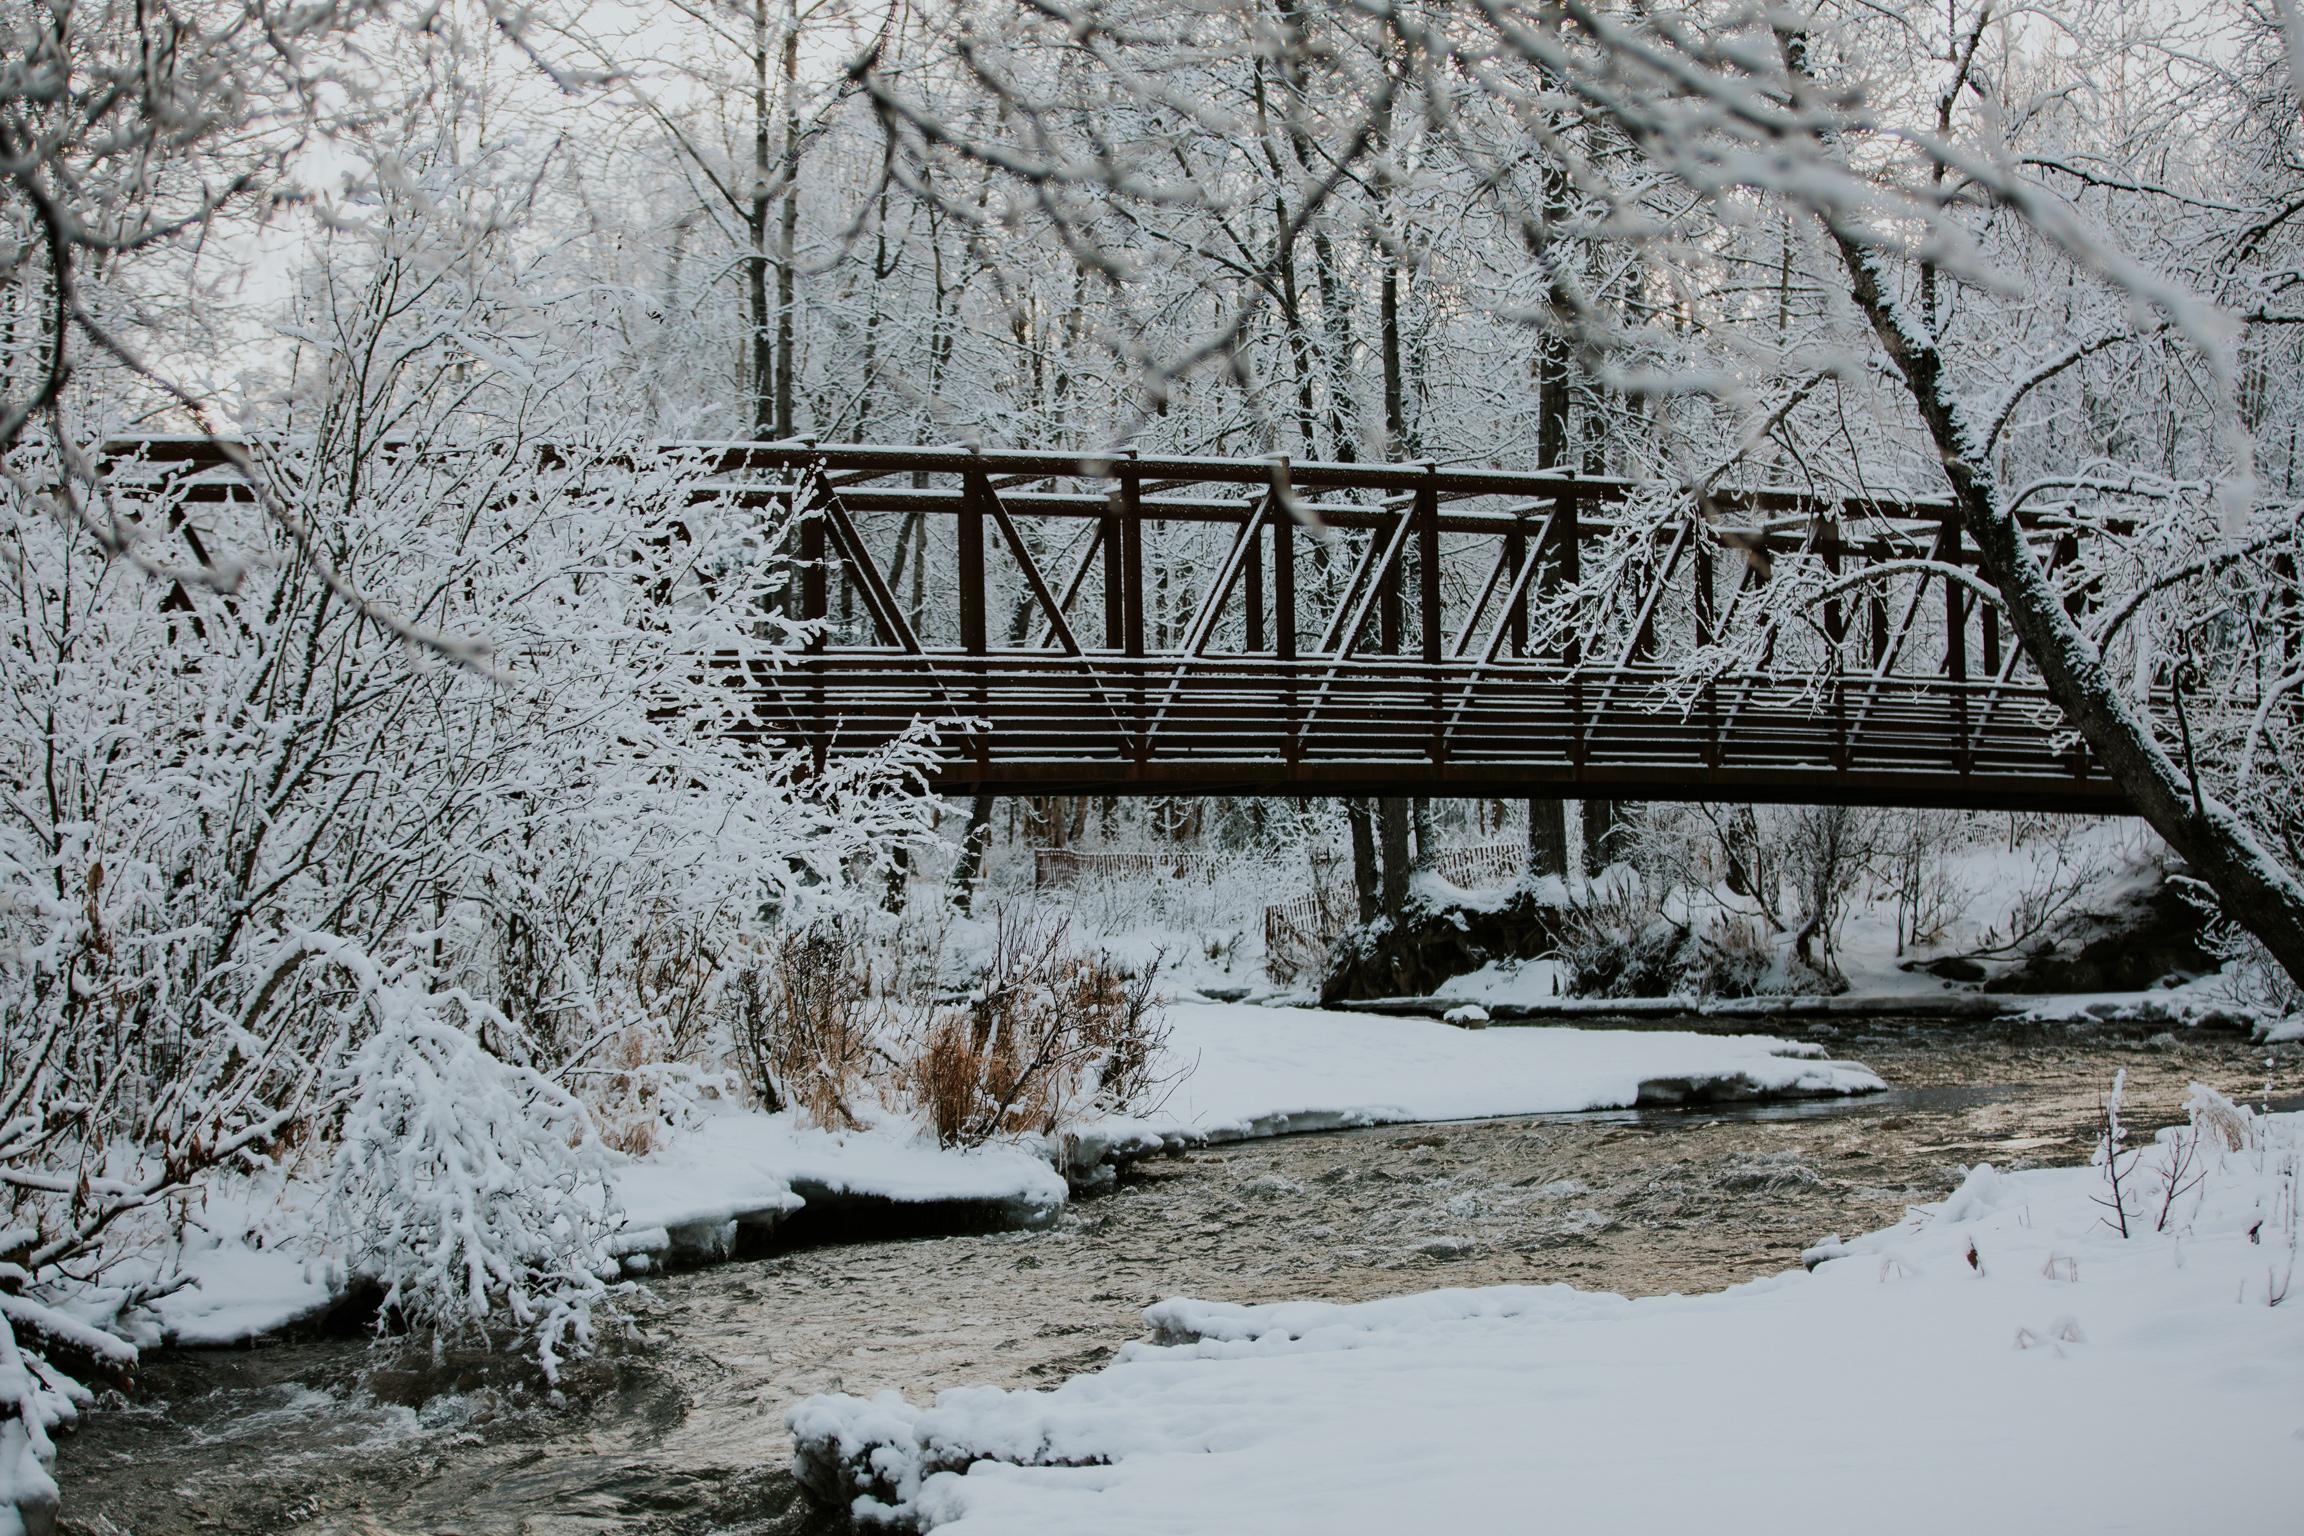 CindyGiovagnoli_Alaska_Anchorage_CampbellTract_Bicentennial_Park_winter_snow-001.jpg